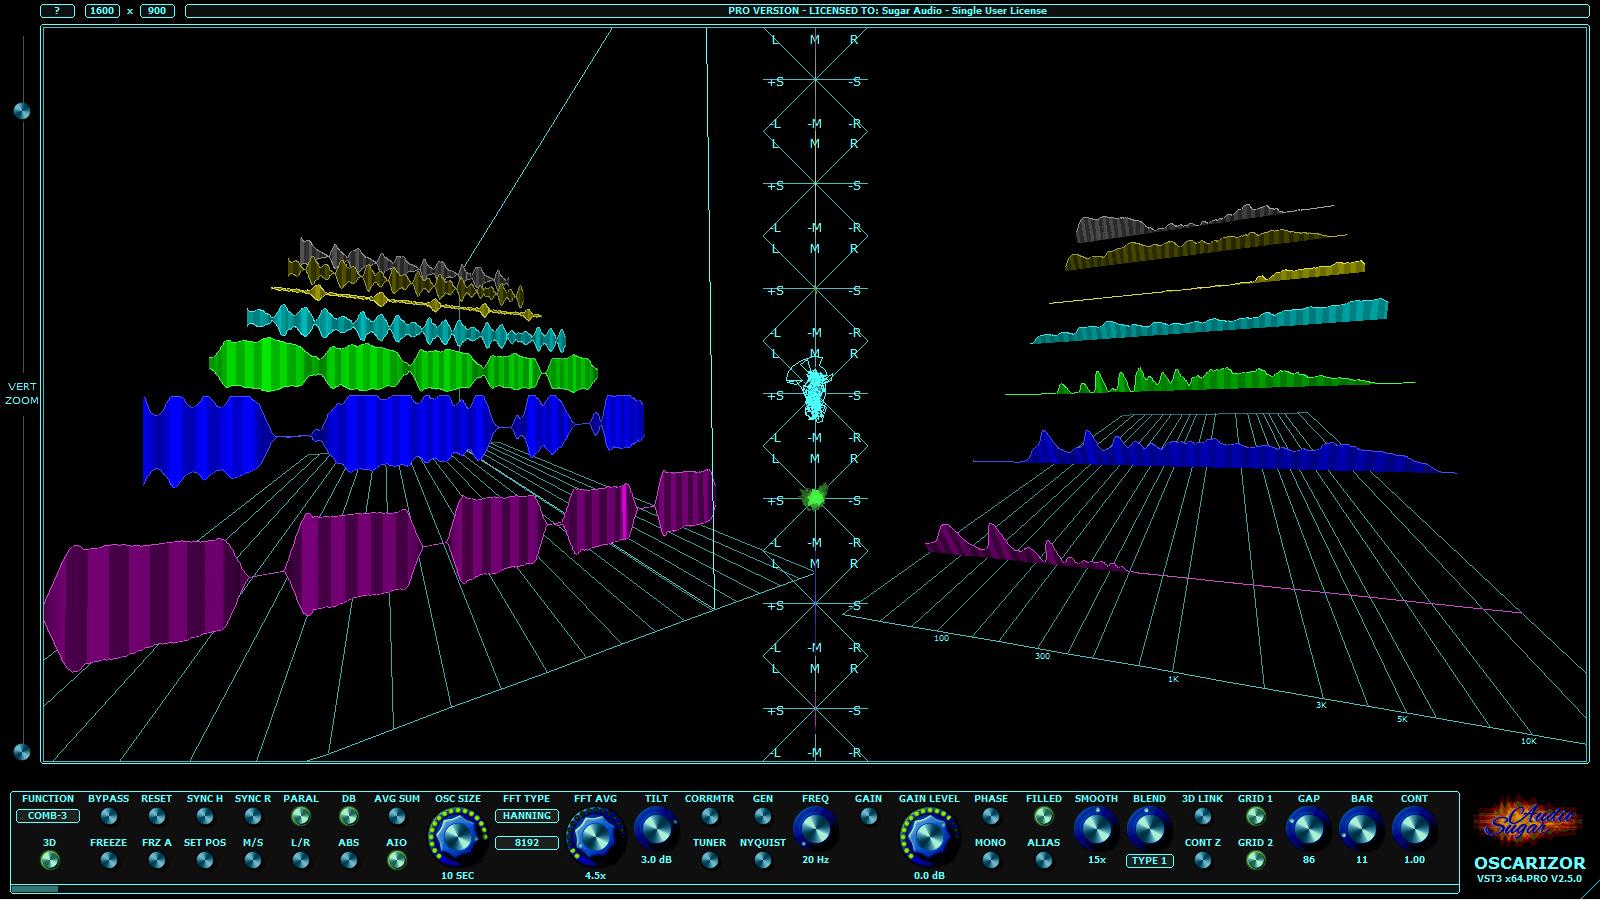 Sugar Audio Oscarizer 2.5  comb3dparallel